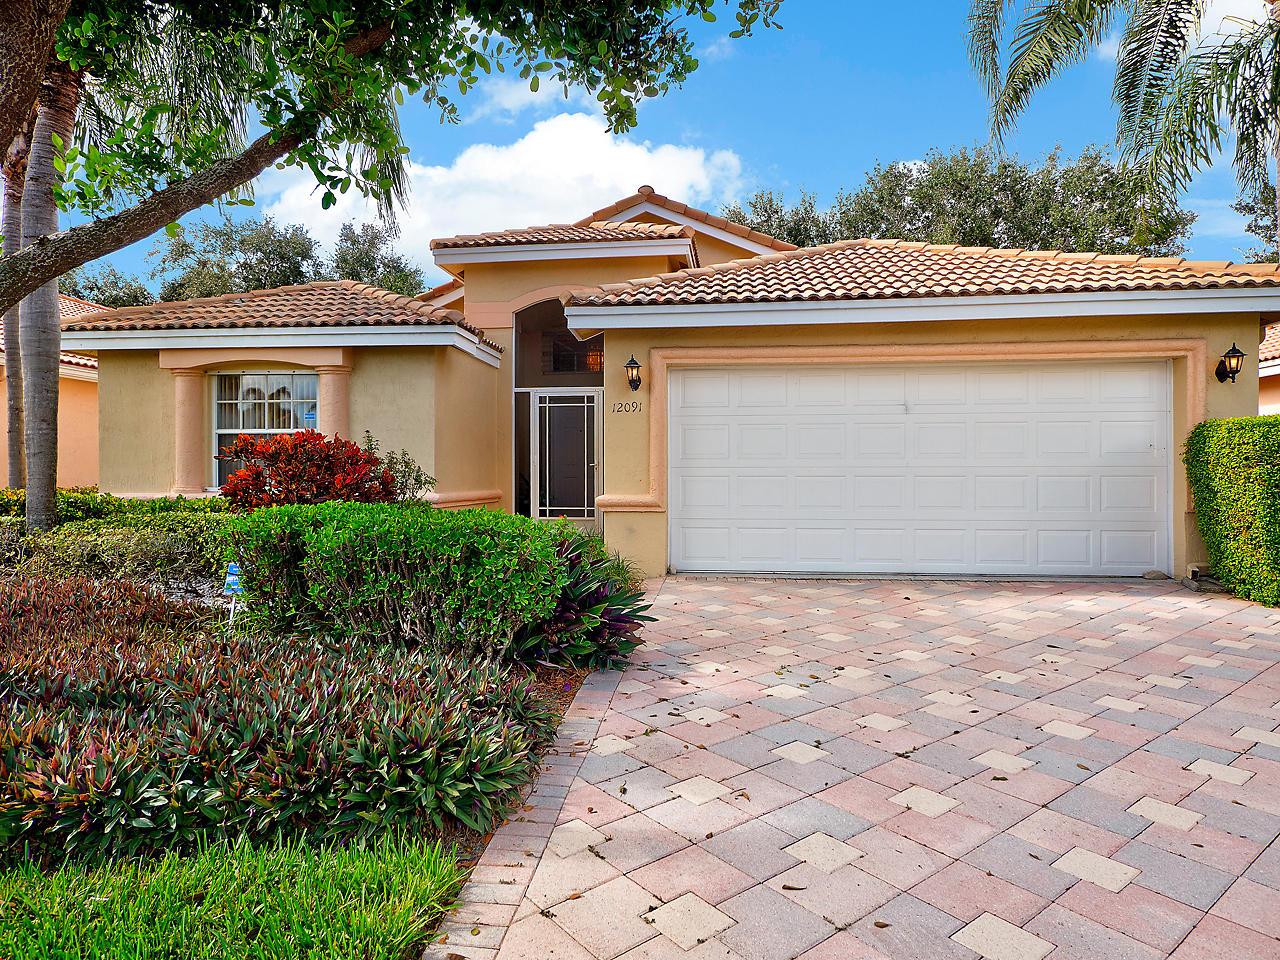 12091 Lido Lane, Boynton Beach, Florida 33437, 3 Bedrooms Bedrooms, ,2 BathroomsBathrooms,Single Family,For Sale,San Marco,Lido,RX-10479380